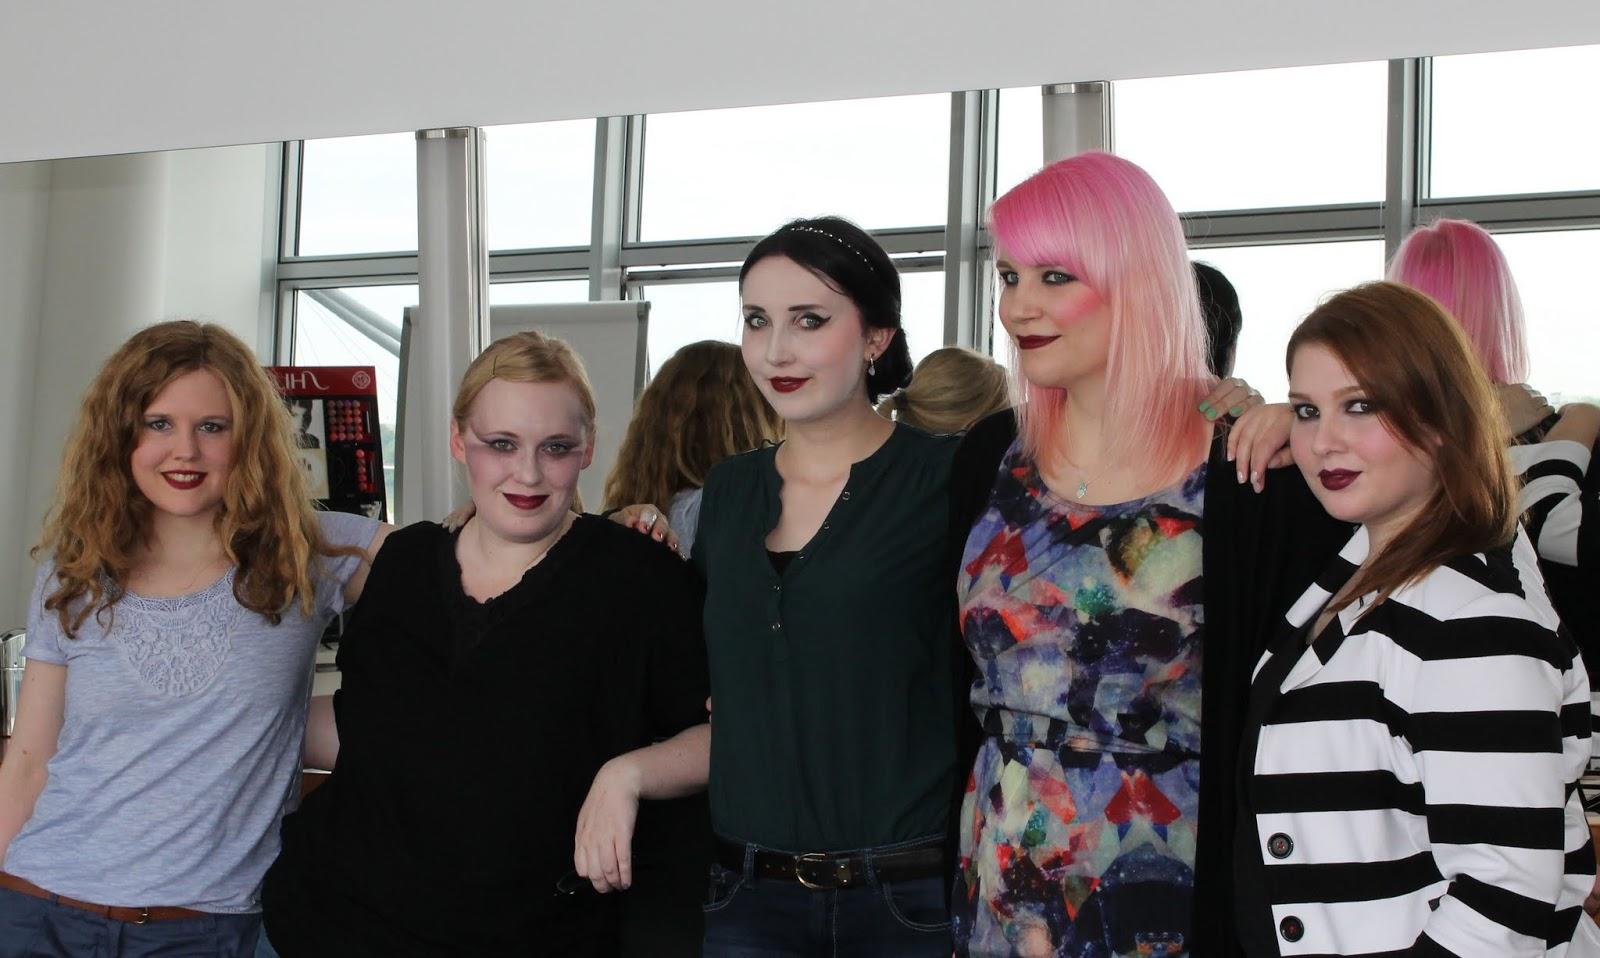 Gruppenbild Serge Lutens Event Shiseido Beauty Academy in Düsseldorf